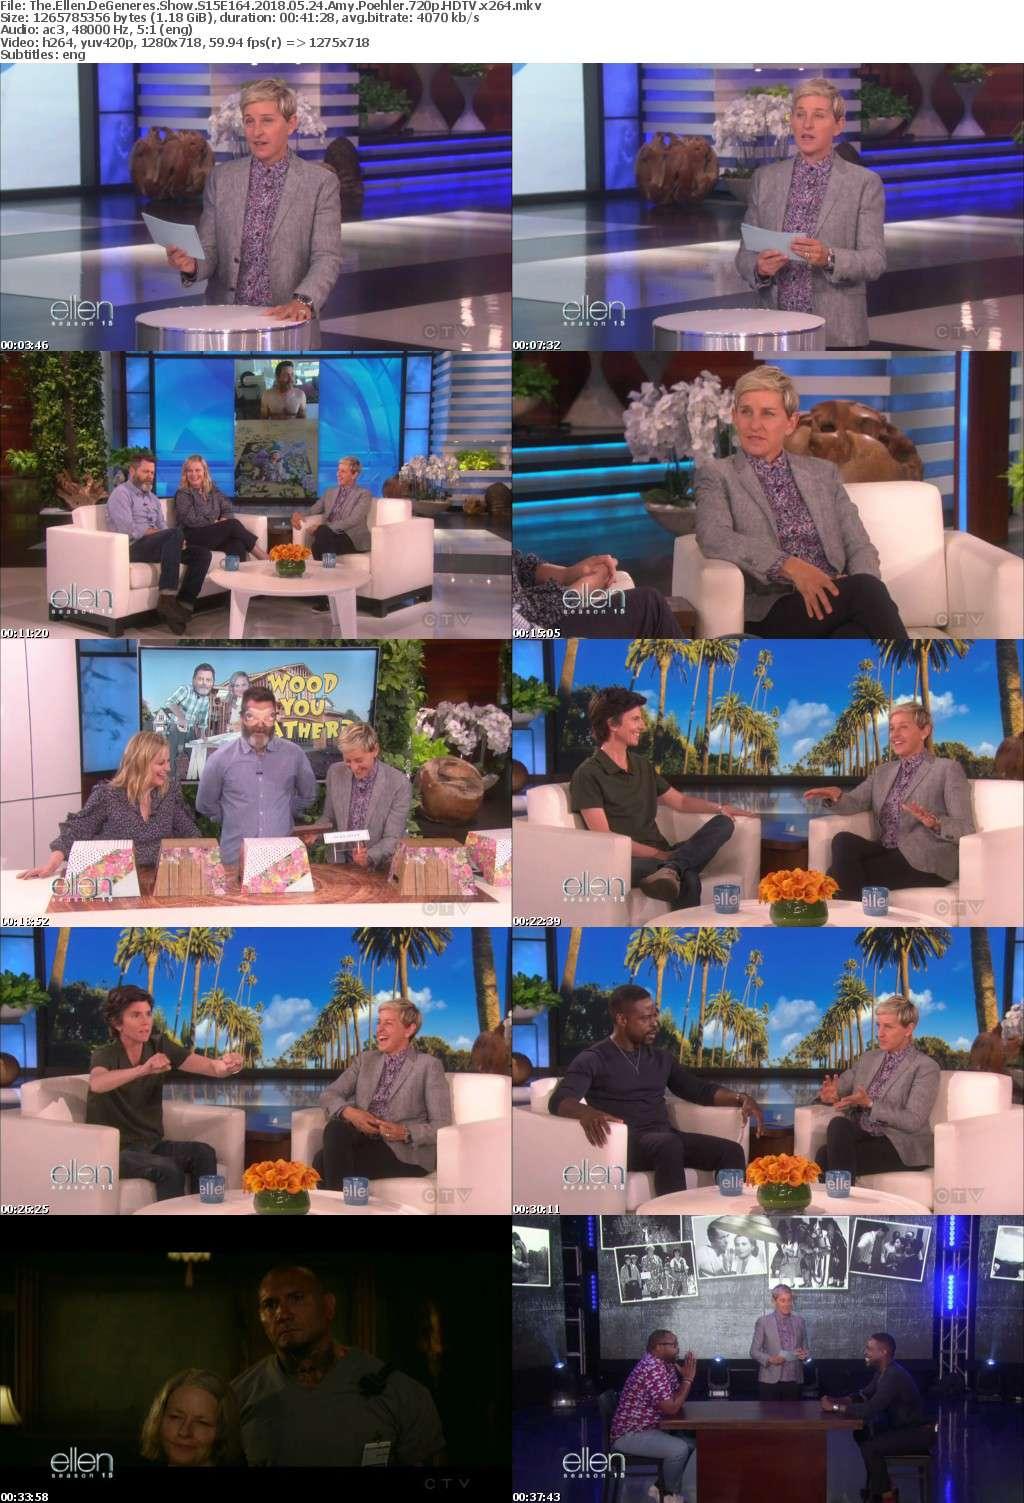 The Ellen DeGeneres Show S15E164 2018 05 24 Amy Poehler 720p HDTV x264